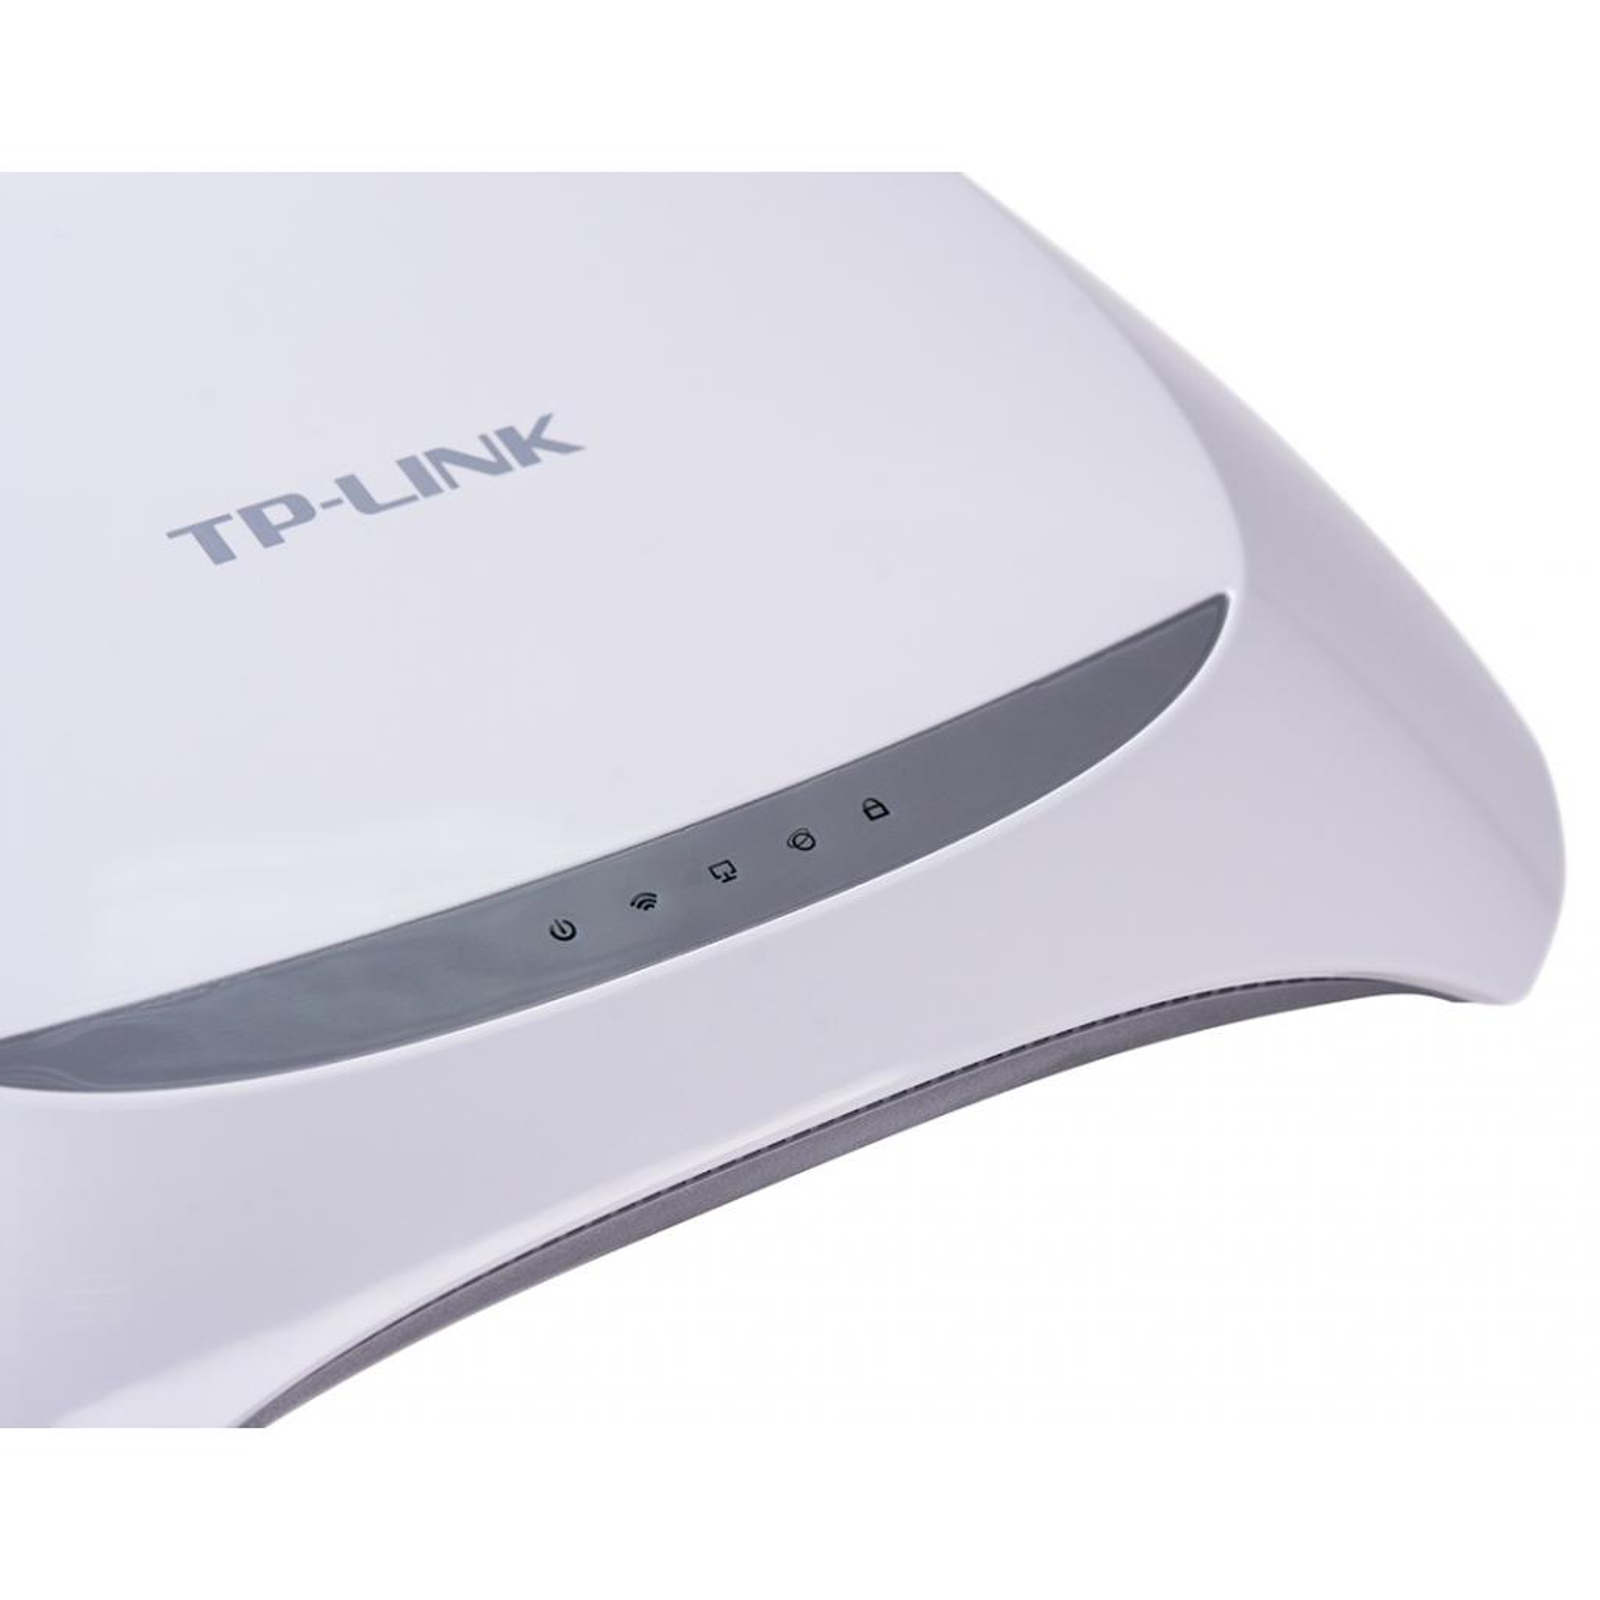 Маршрутизатор TP-Link TL-WR840N зображення 8